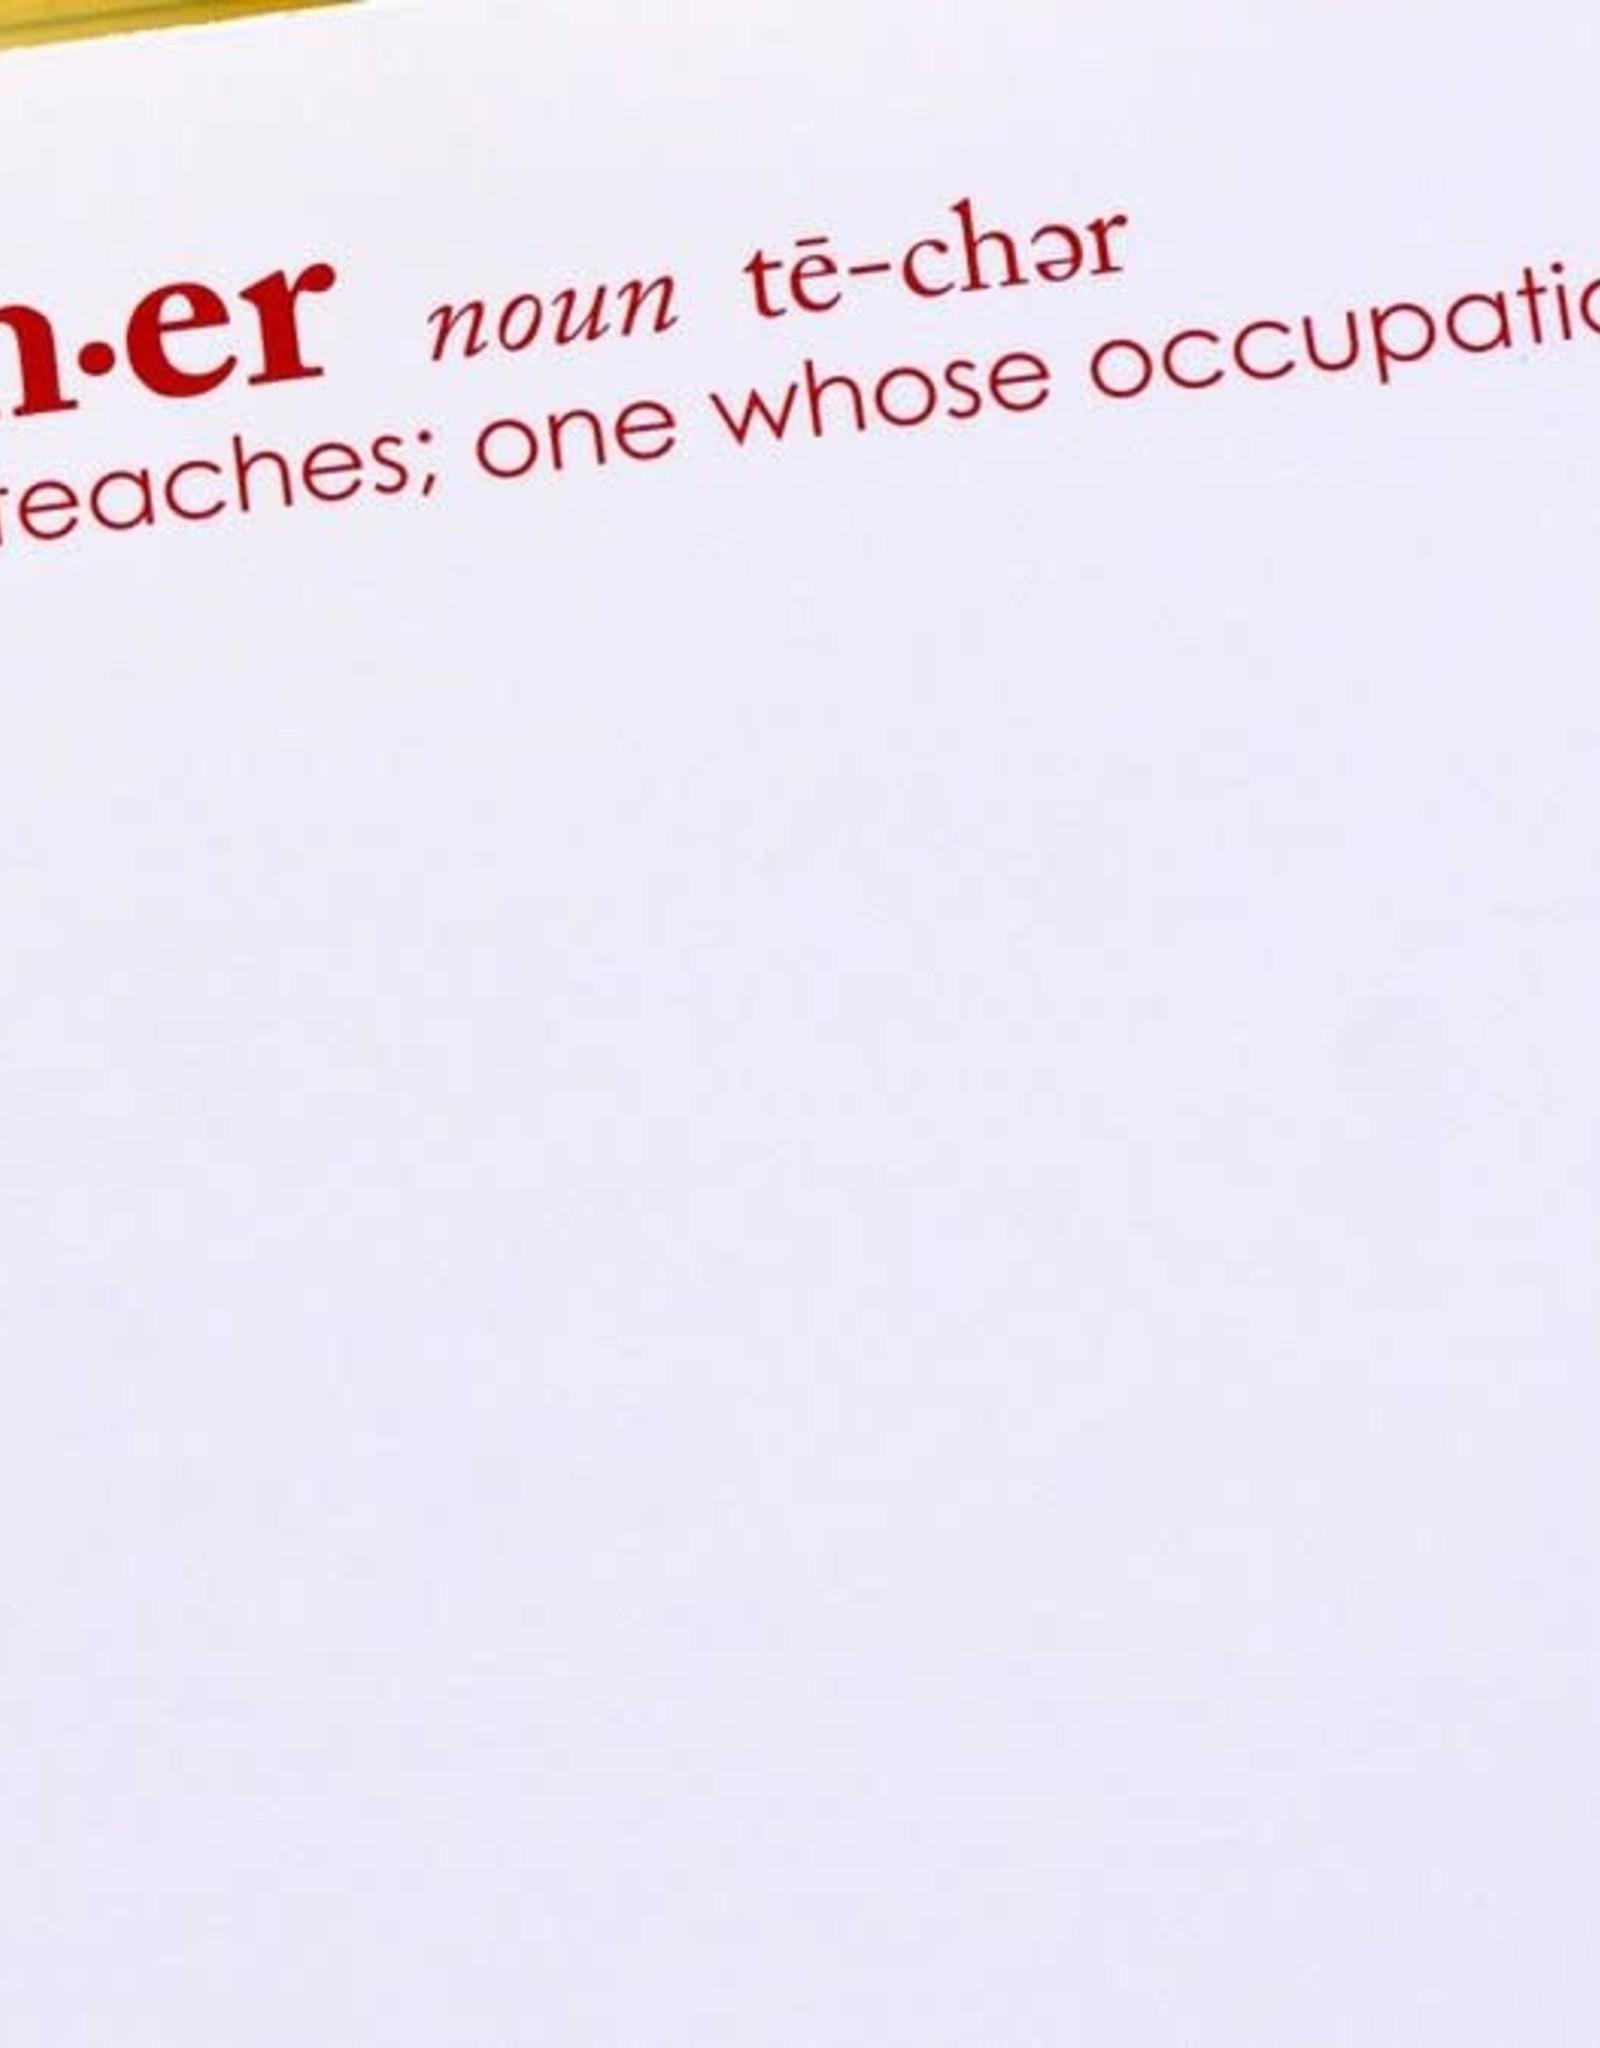 Black Ink Teacher Noun Lux Notepad